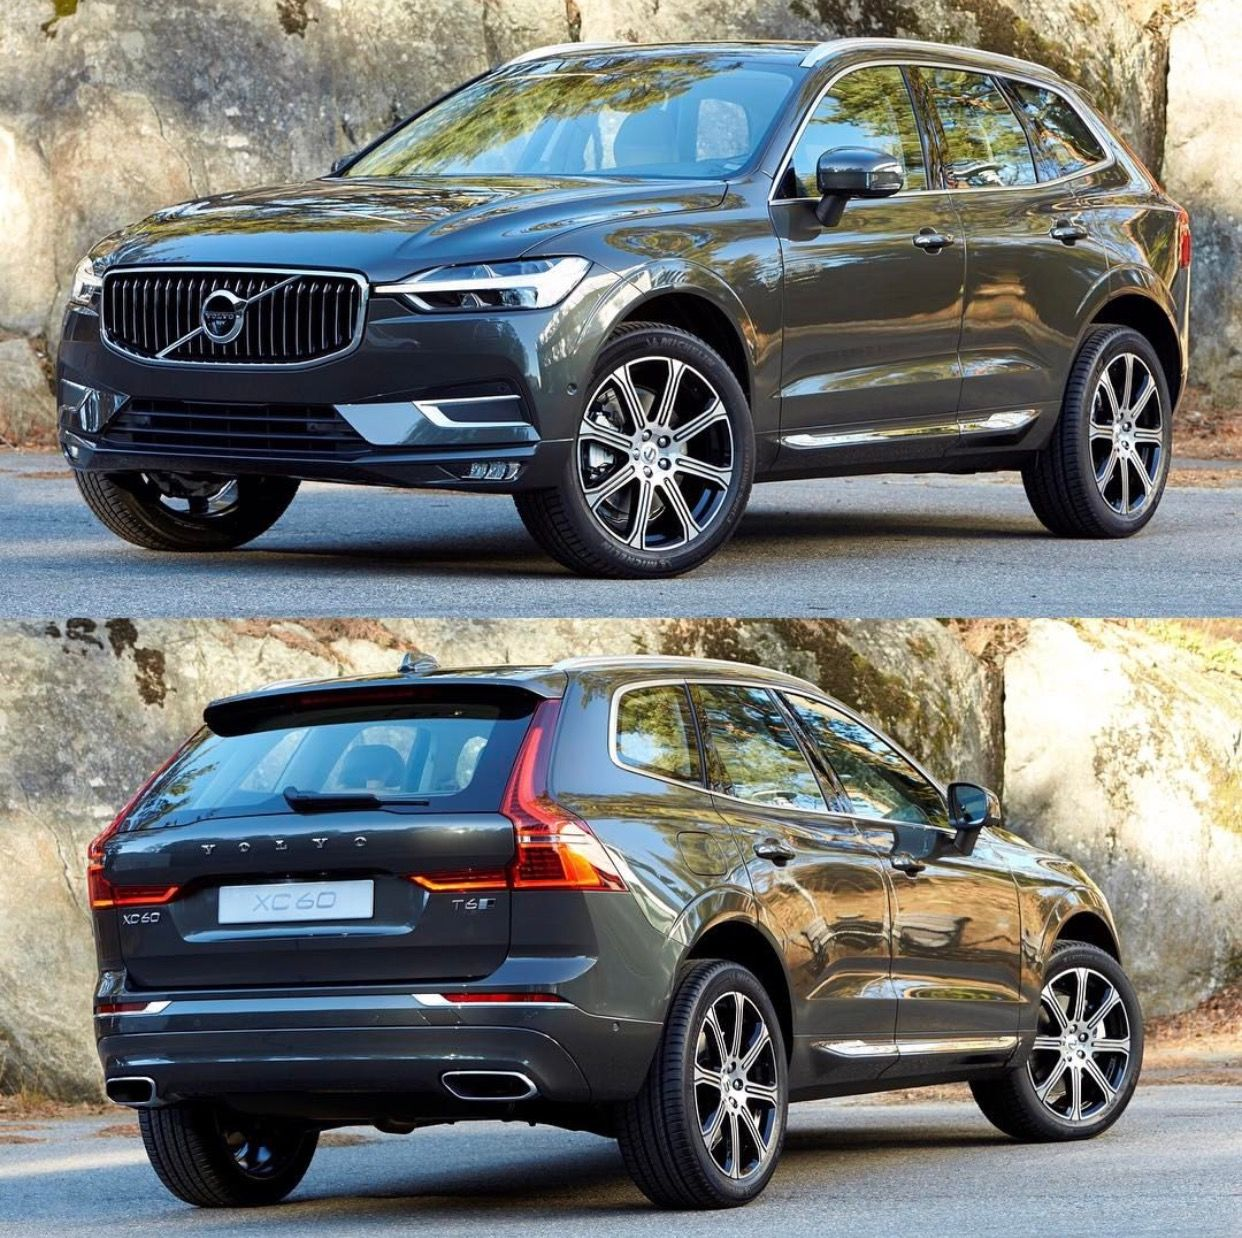 Volvo Xc60 Suv: Volvo Suv, Volvo Xc, Volvo Xc90 2017